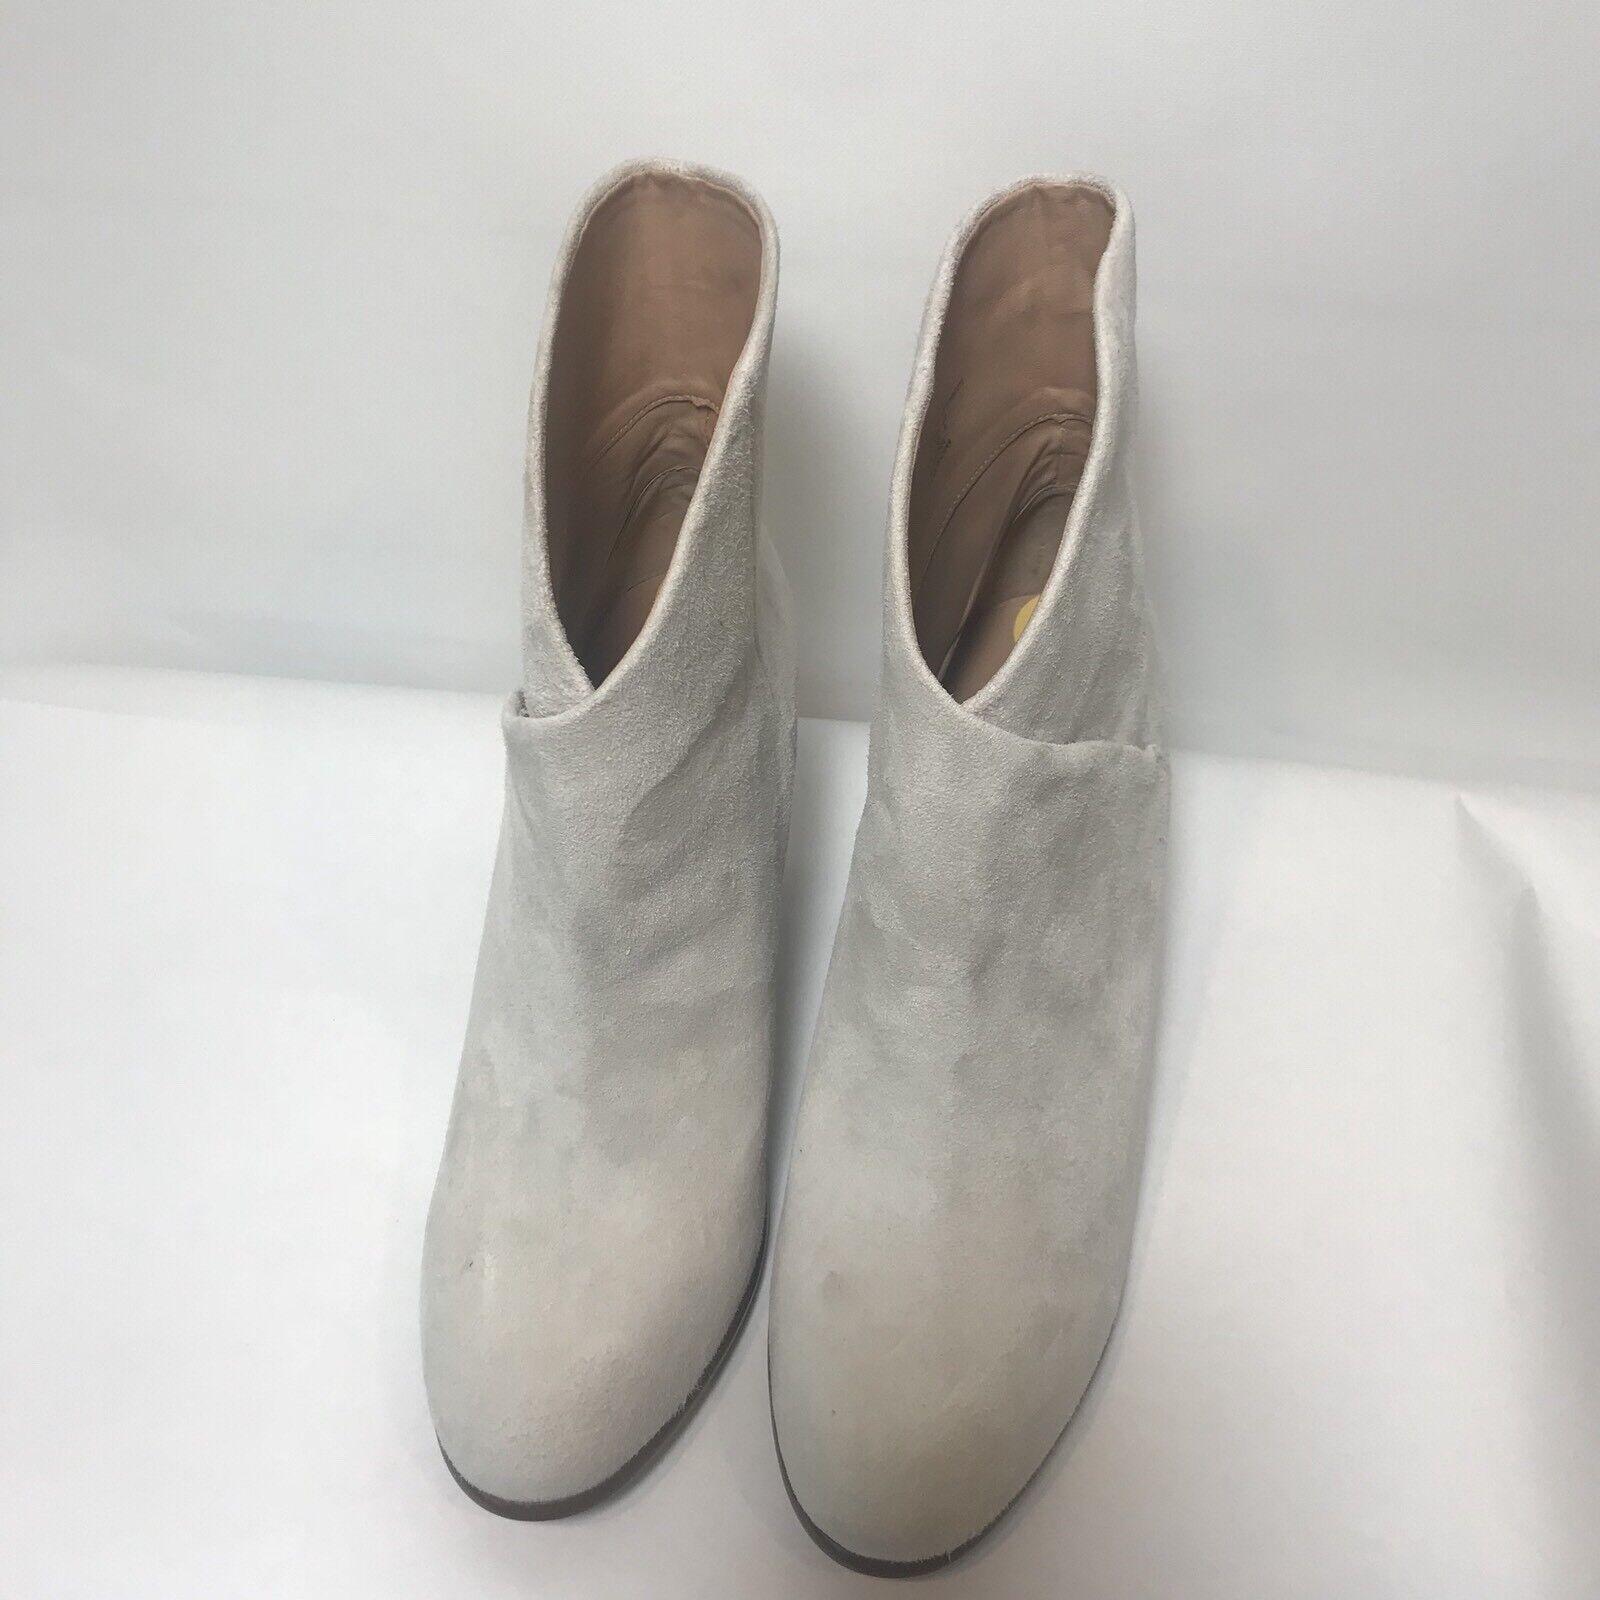 Joe's Para Mujer Mujer Mujer Talla 11 Tisha Botines botas al tobillo de cruce de gamuza Marfil Crema  moda